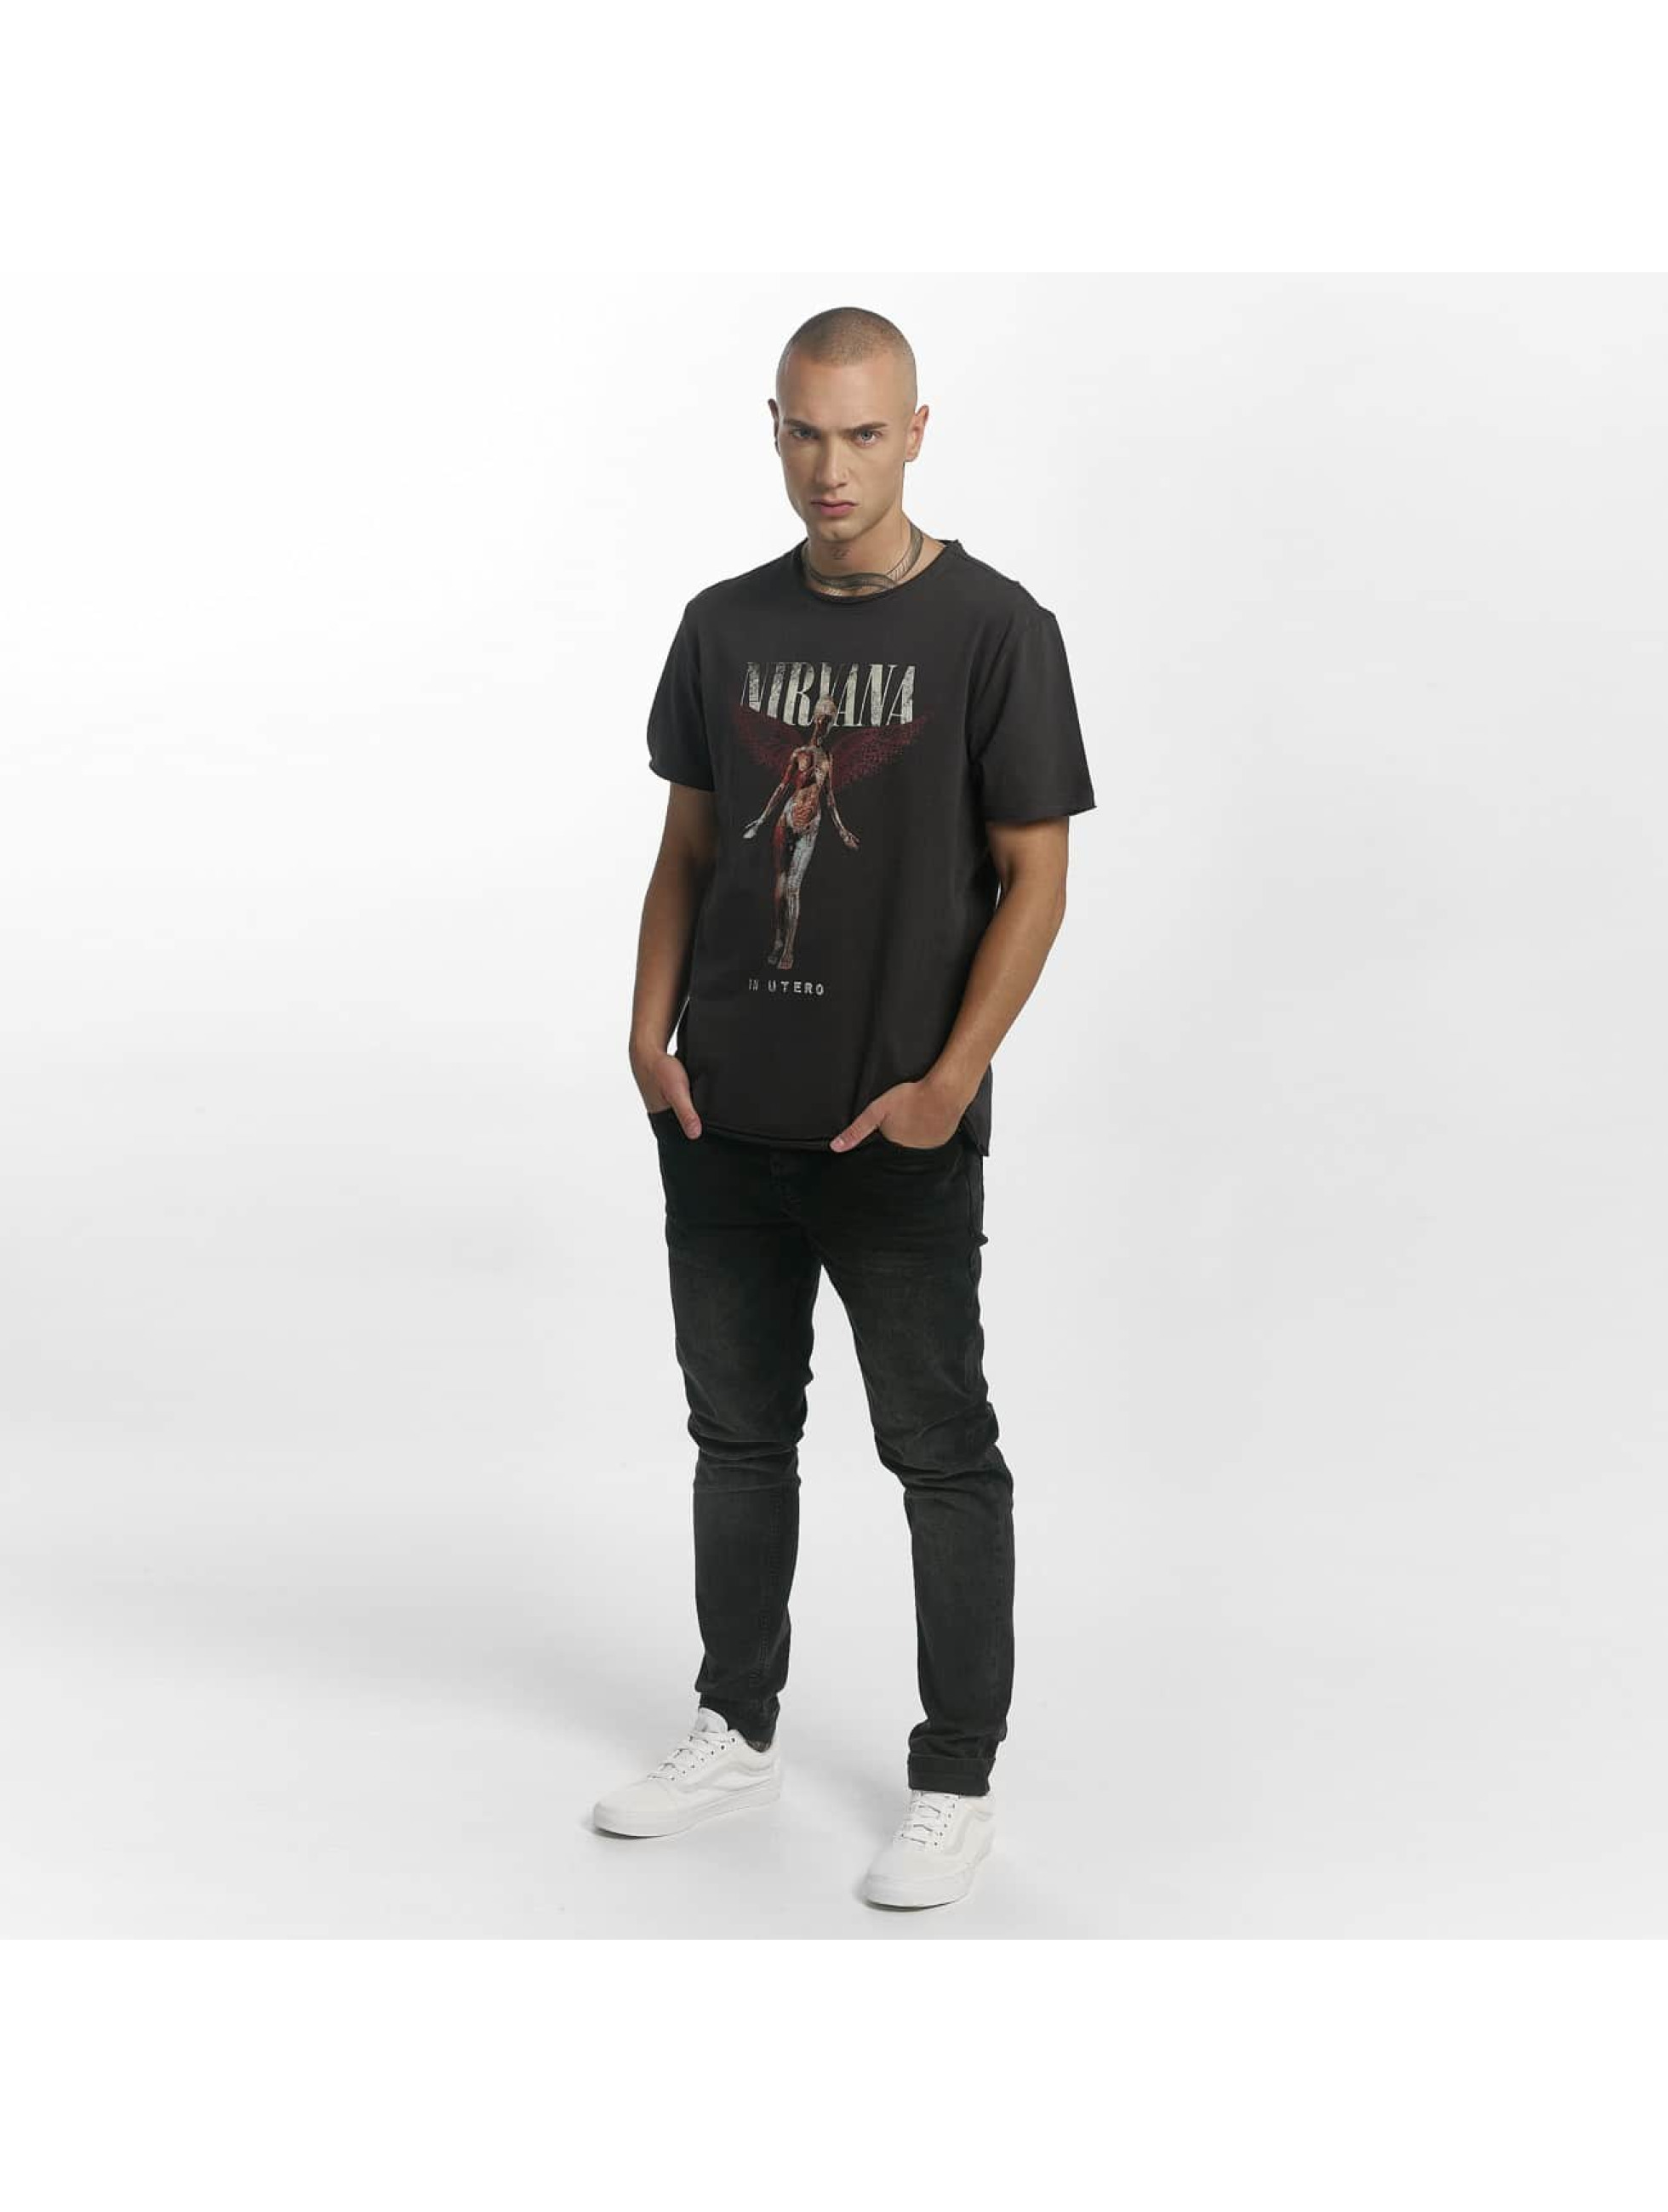 Amplified T-Shirt Nirvana In Utero grey